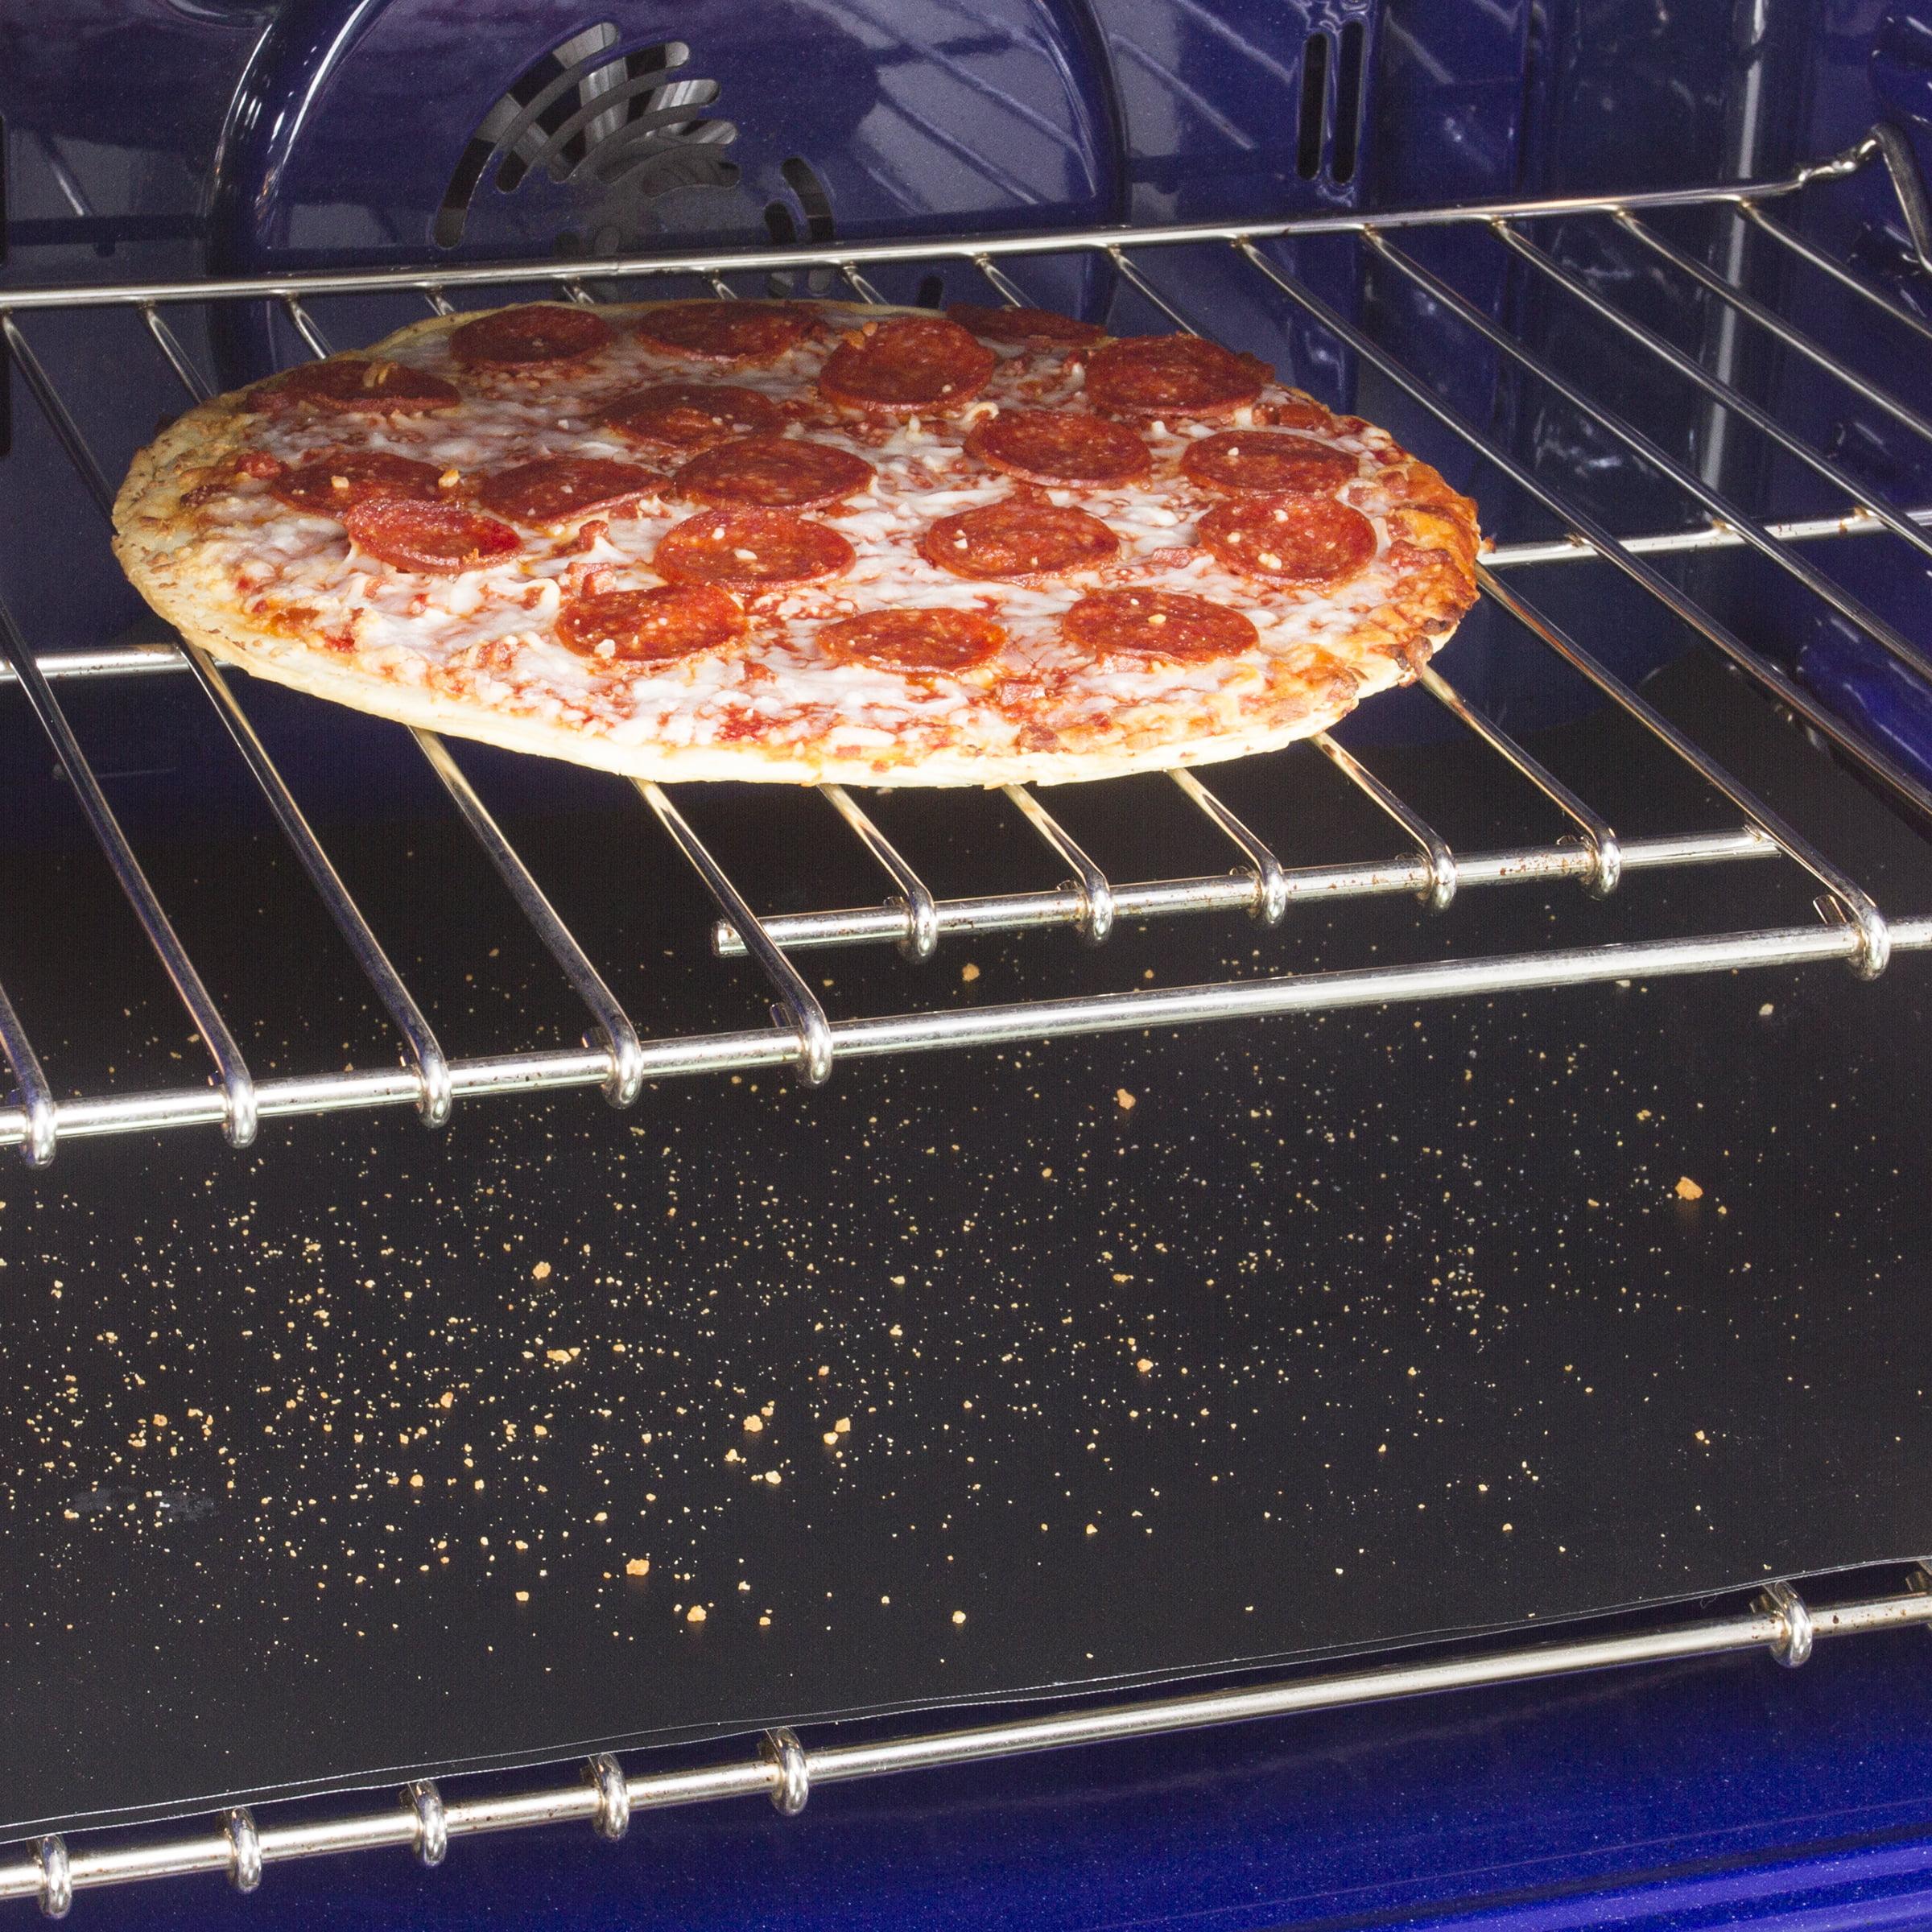 Kitchen Home Oven Liner Set Of 2 Large Heavy Duty Non Stick Reusable Bpa Free Oven Mat Walmart Com Walmart Com